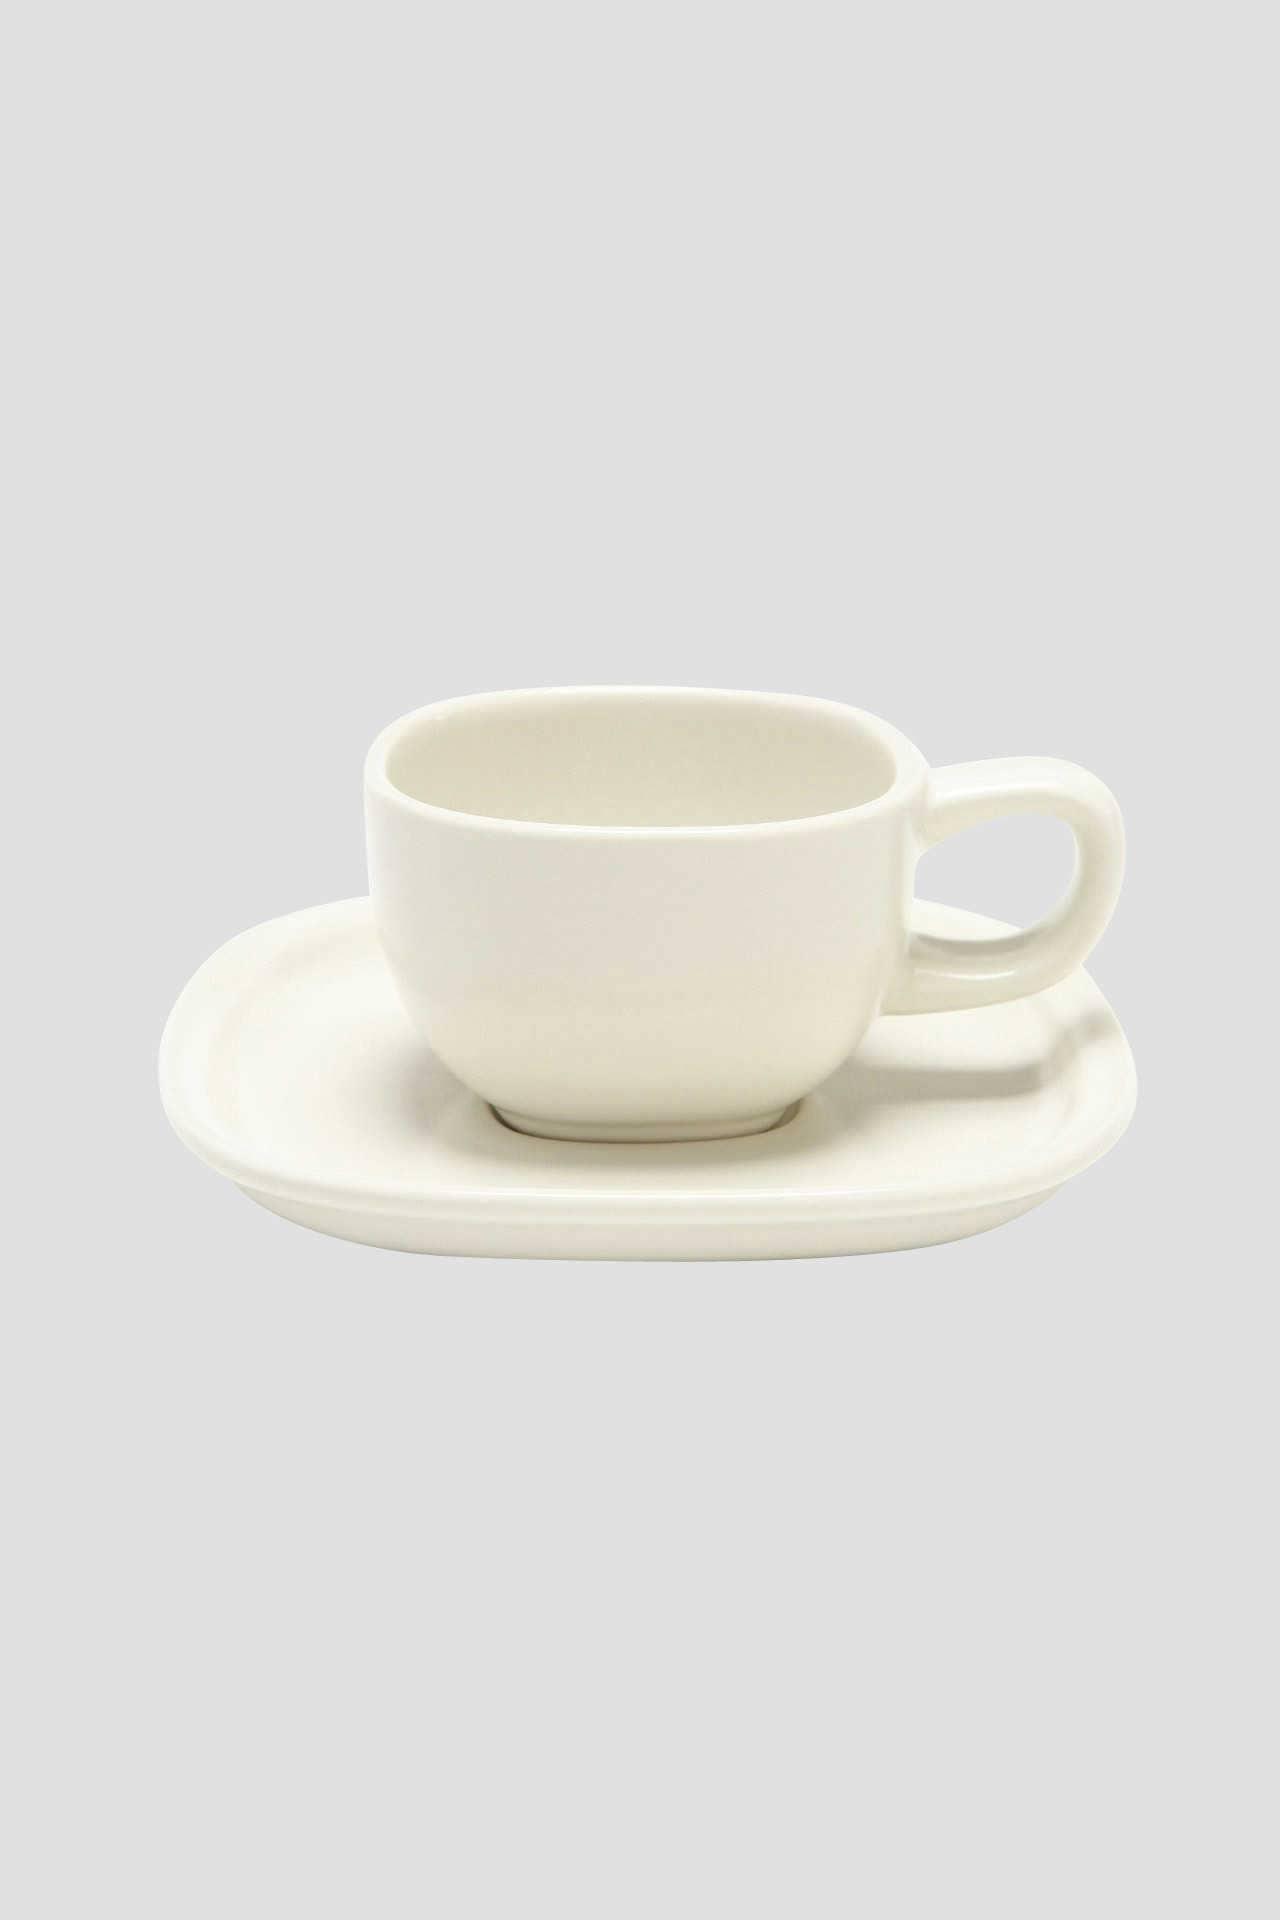 SORI YANAGI CERAMIC COFFEE CUP & SAUCER7